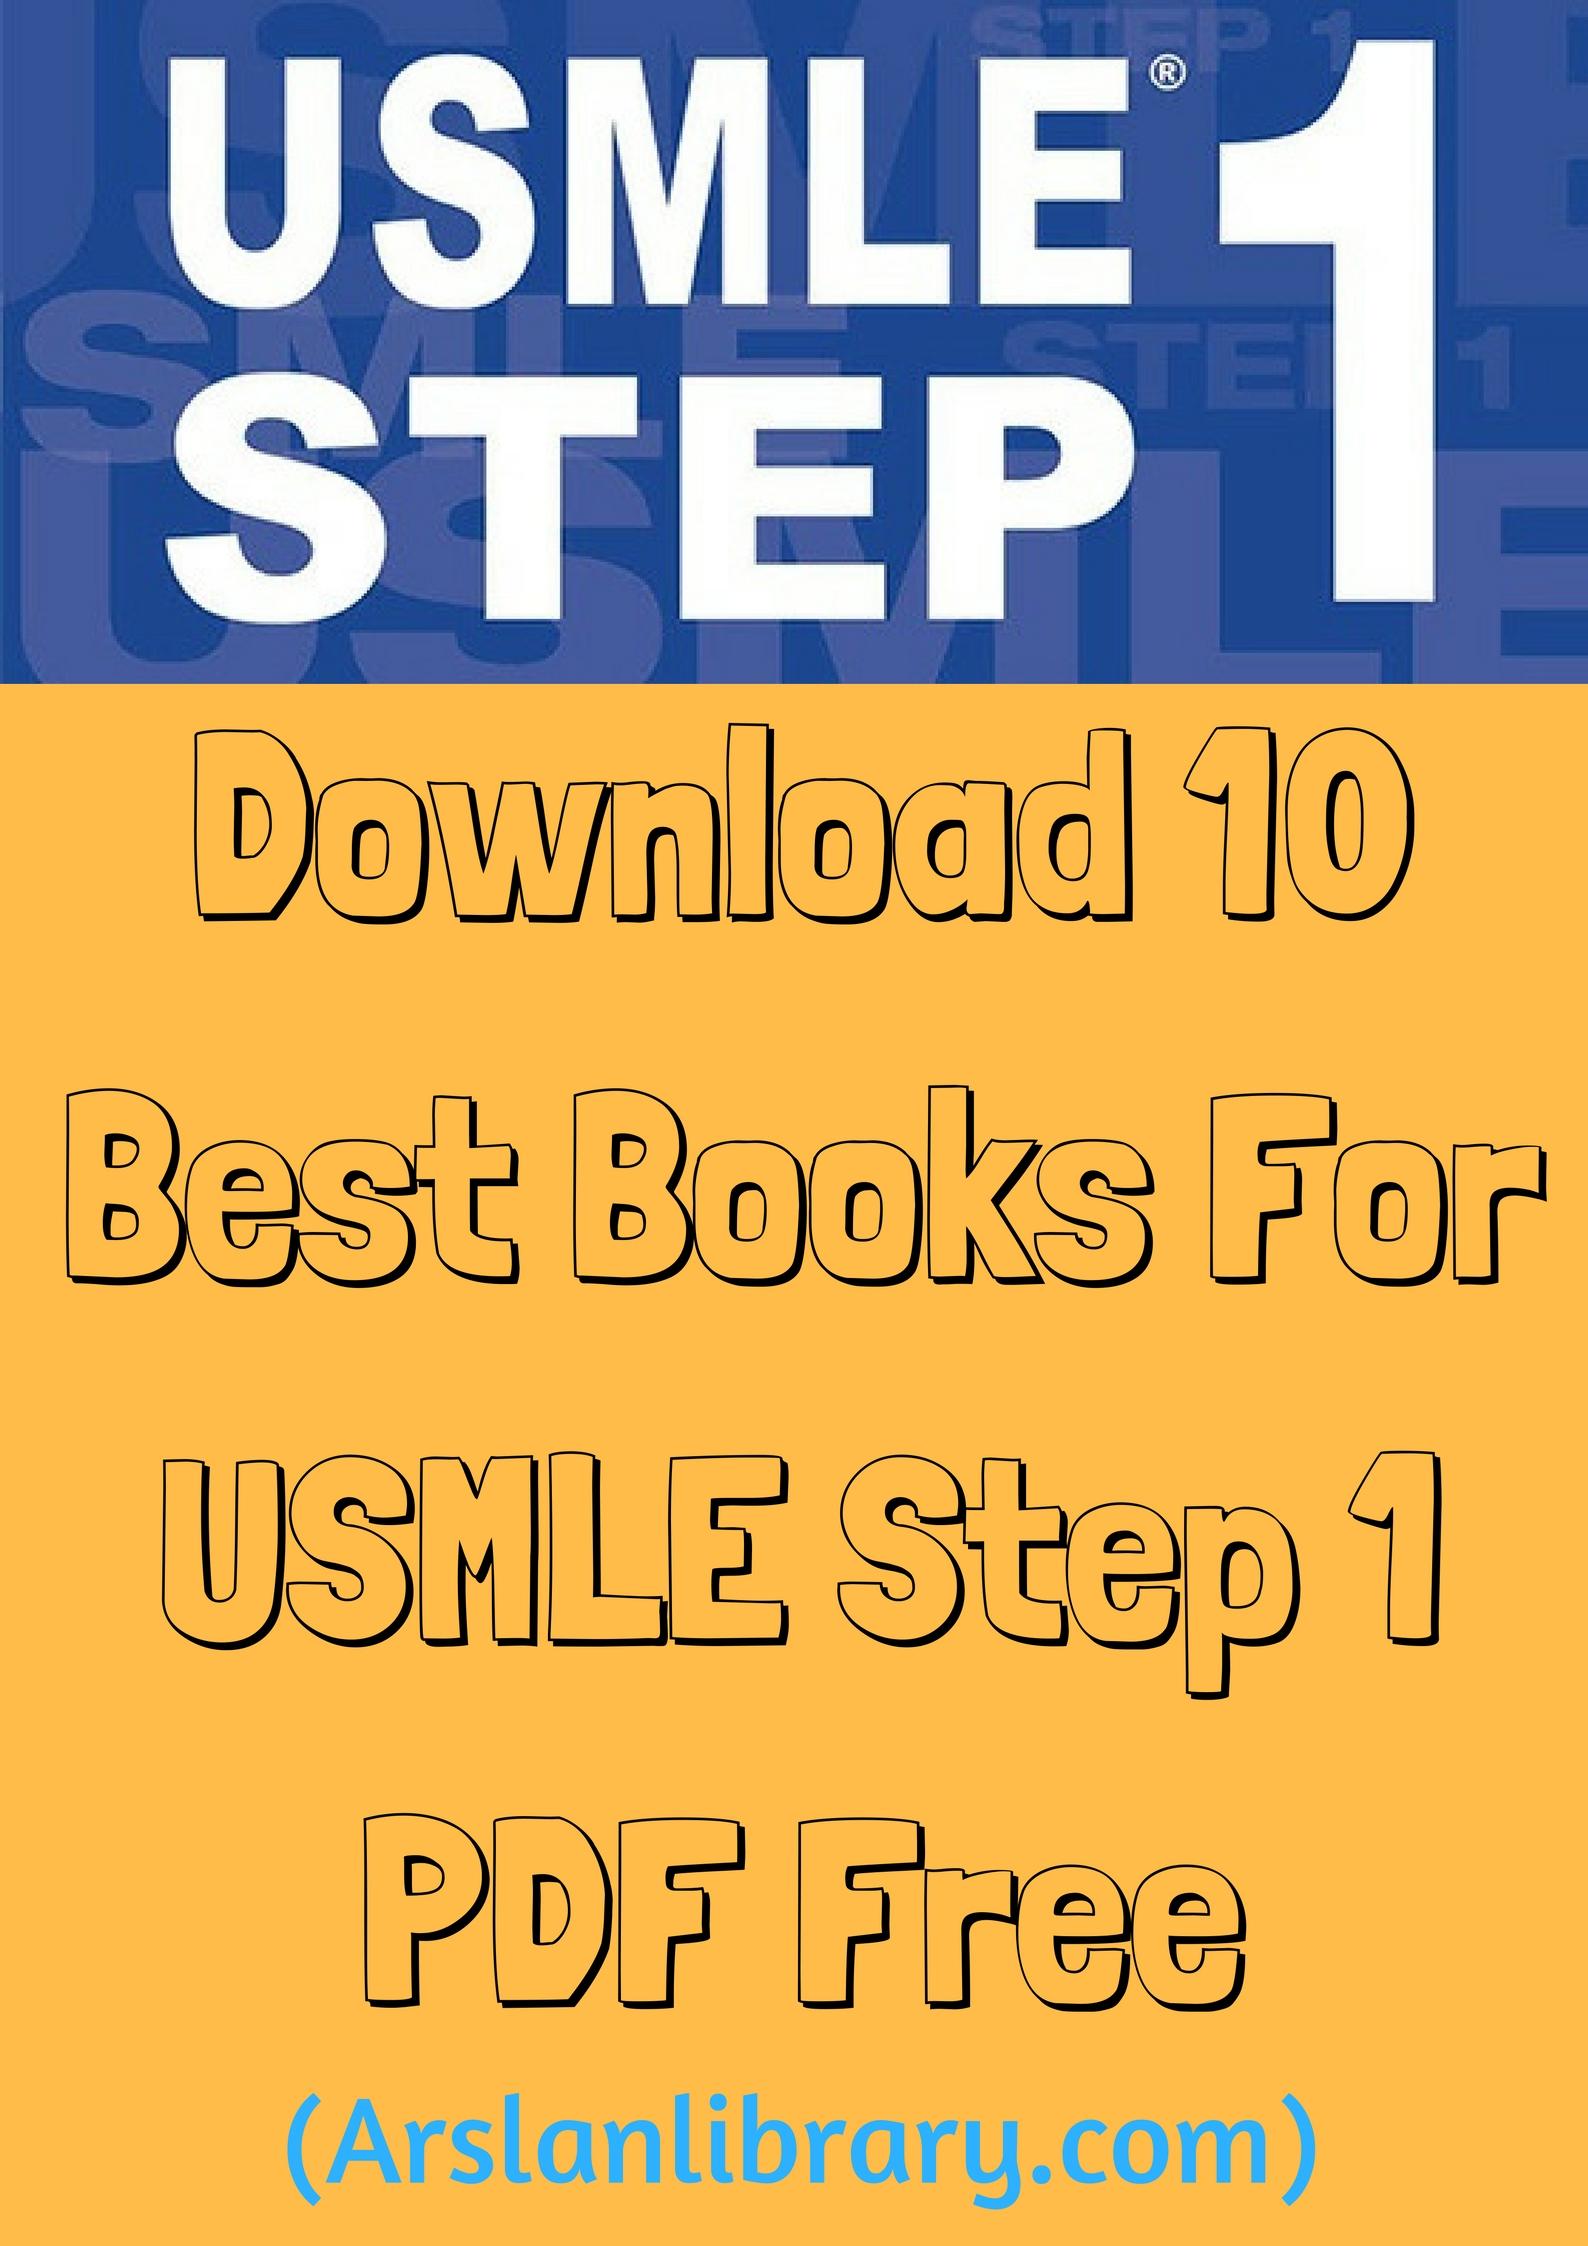 Step 1: Download 10 Best Books For USMLE Step 1 PDF Free